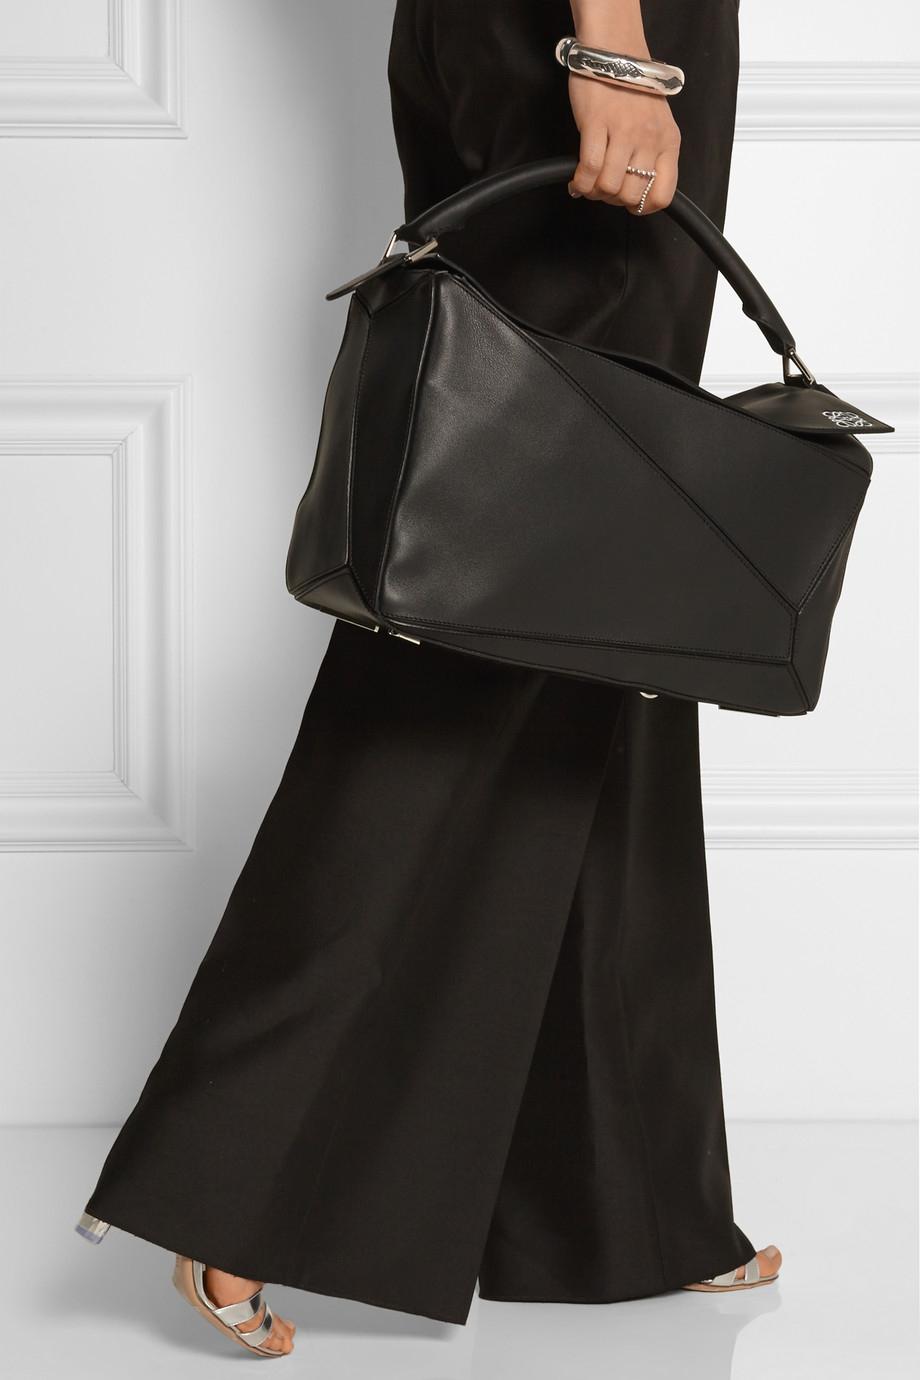 Loewe Puzzle Large Leather Shoulder Bag In Black Lyst